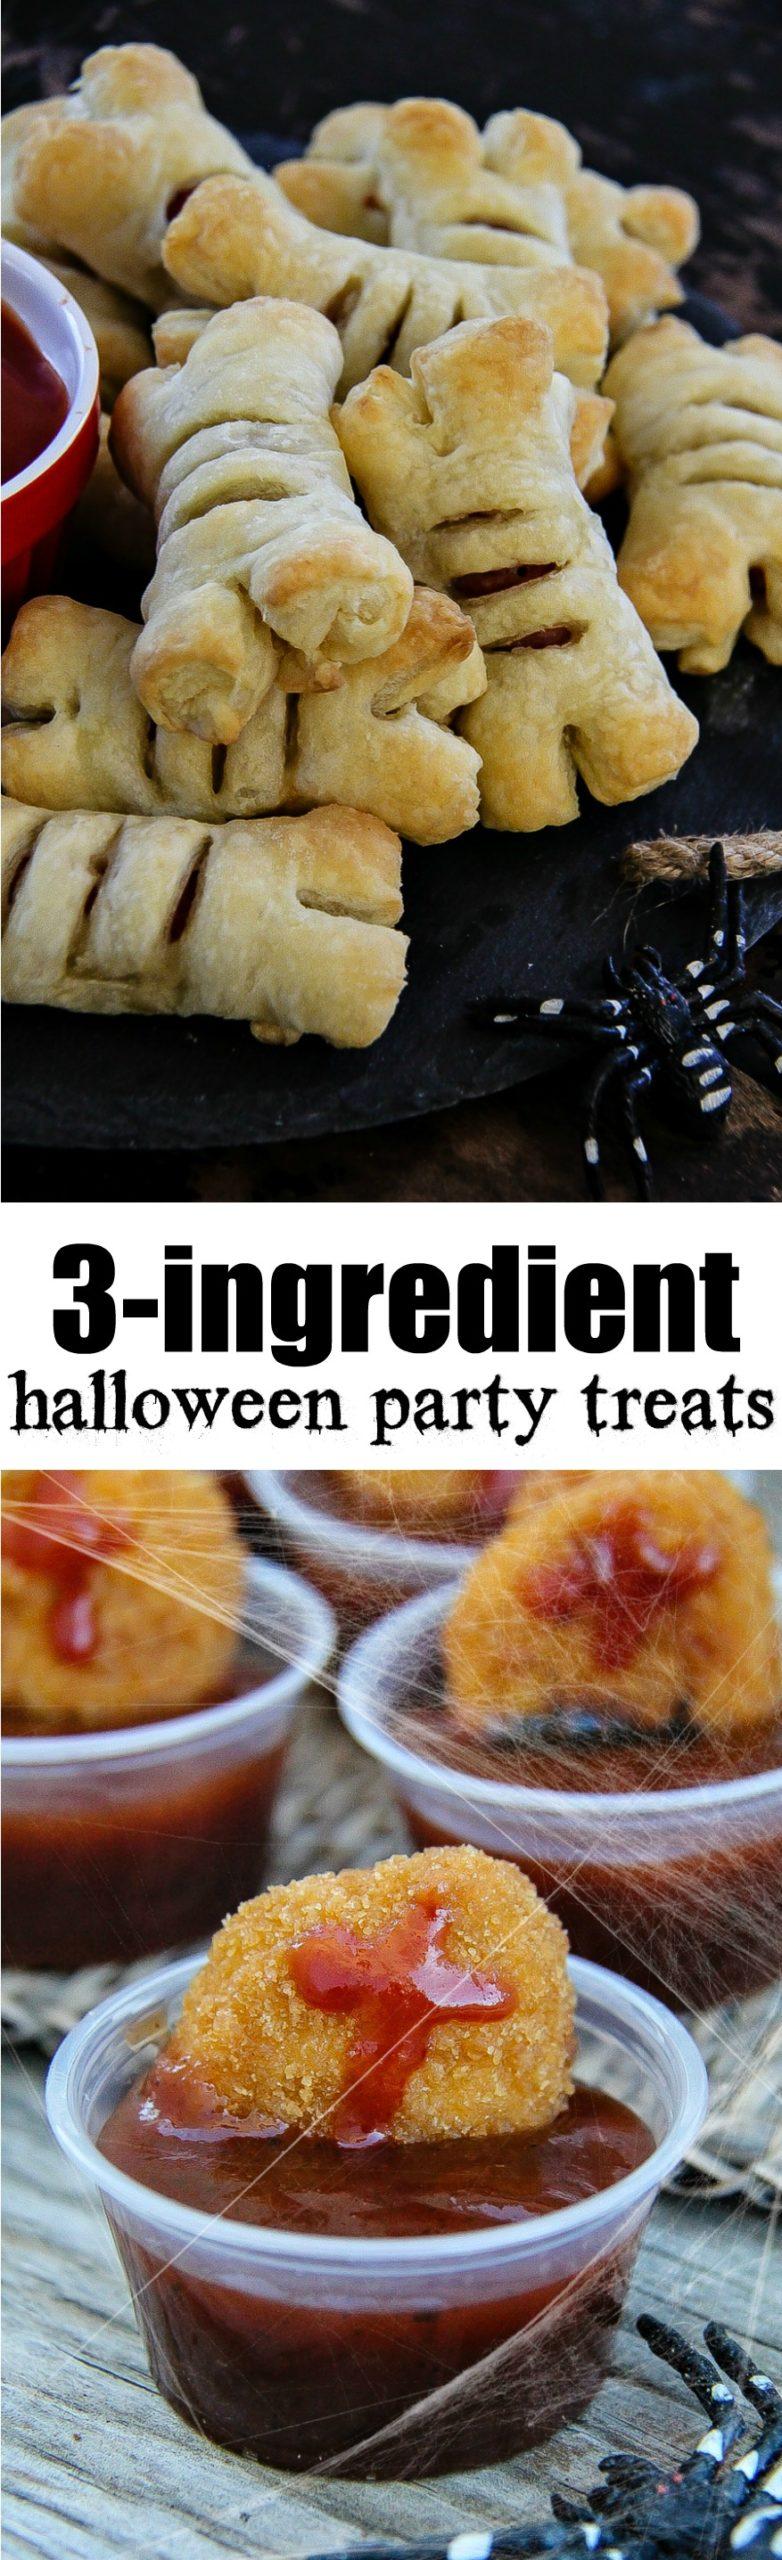 Halloween food ideas Pinterest image